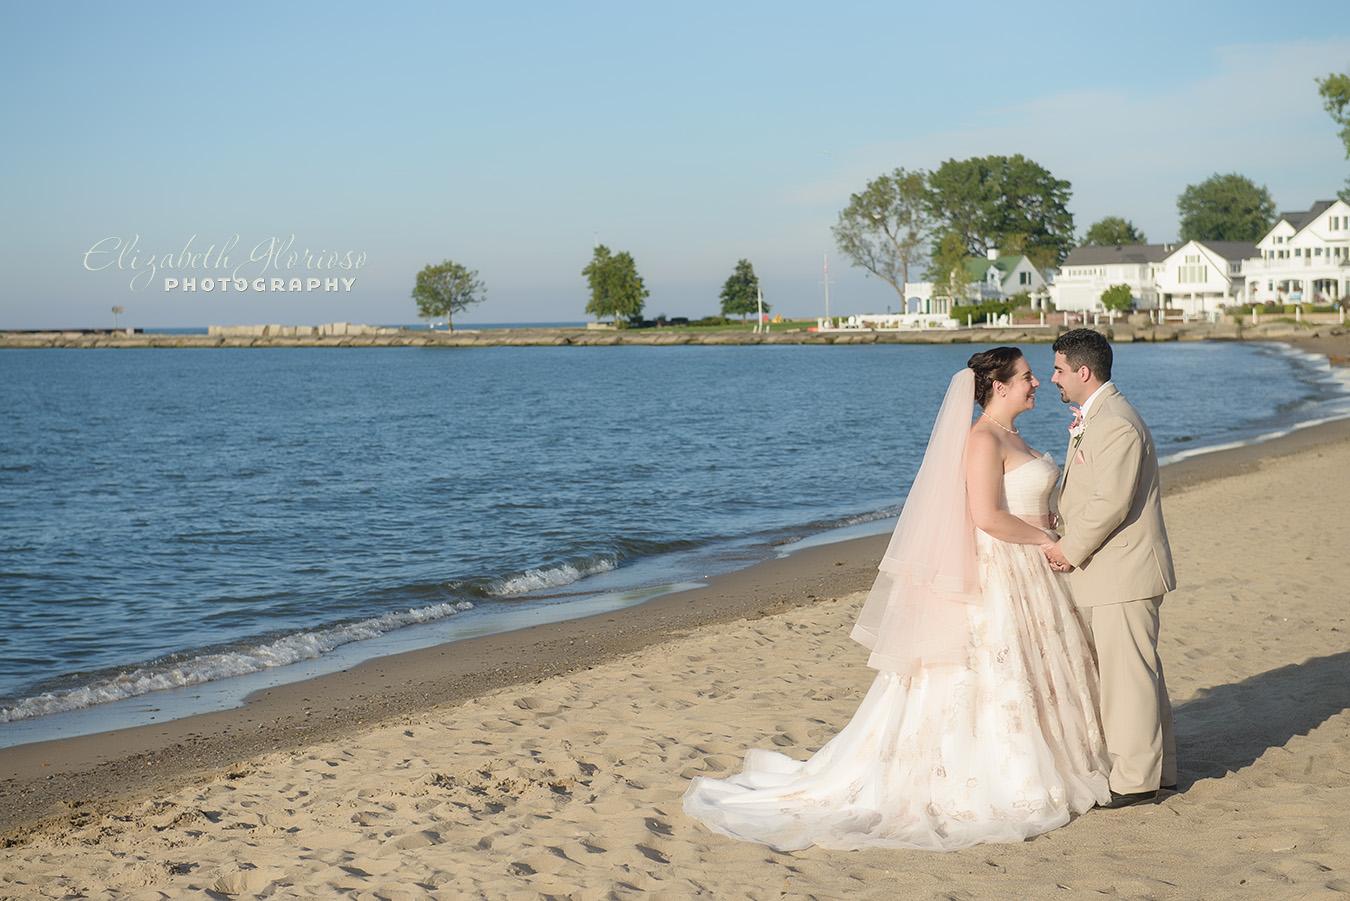 Vermilion_wedding_Glorioso Photography_1037